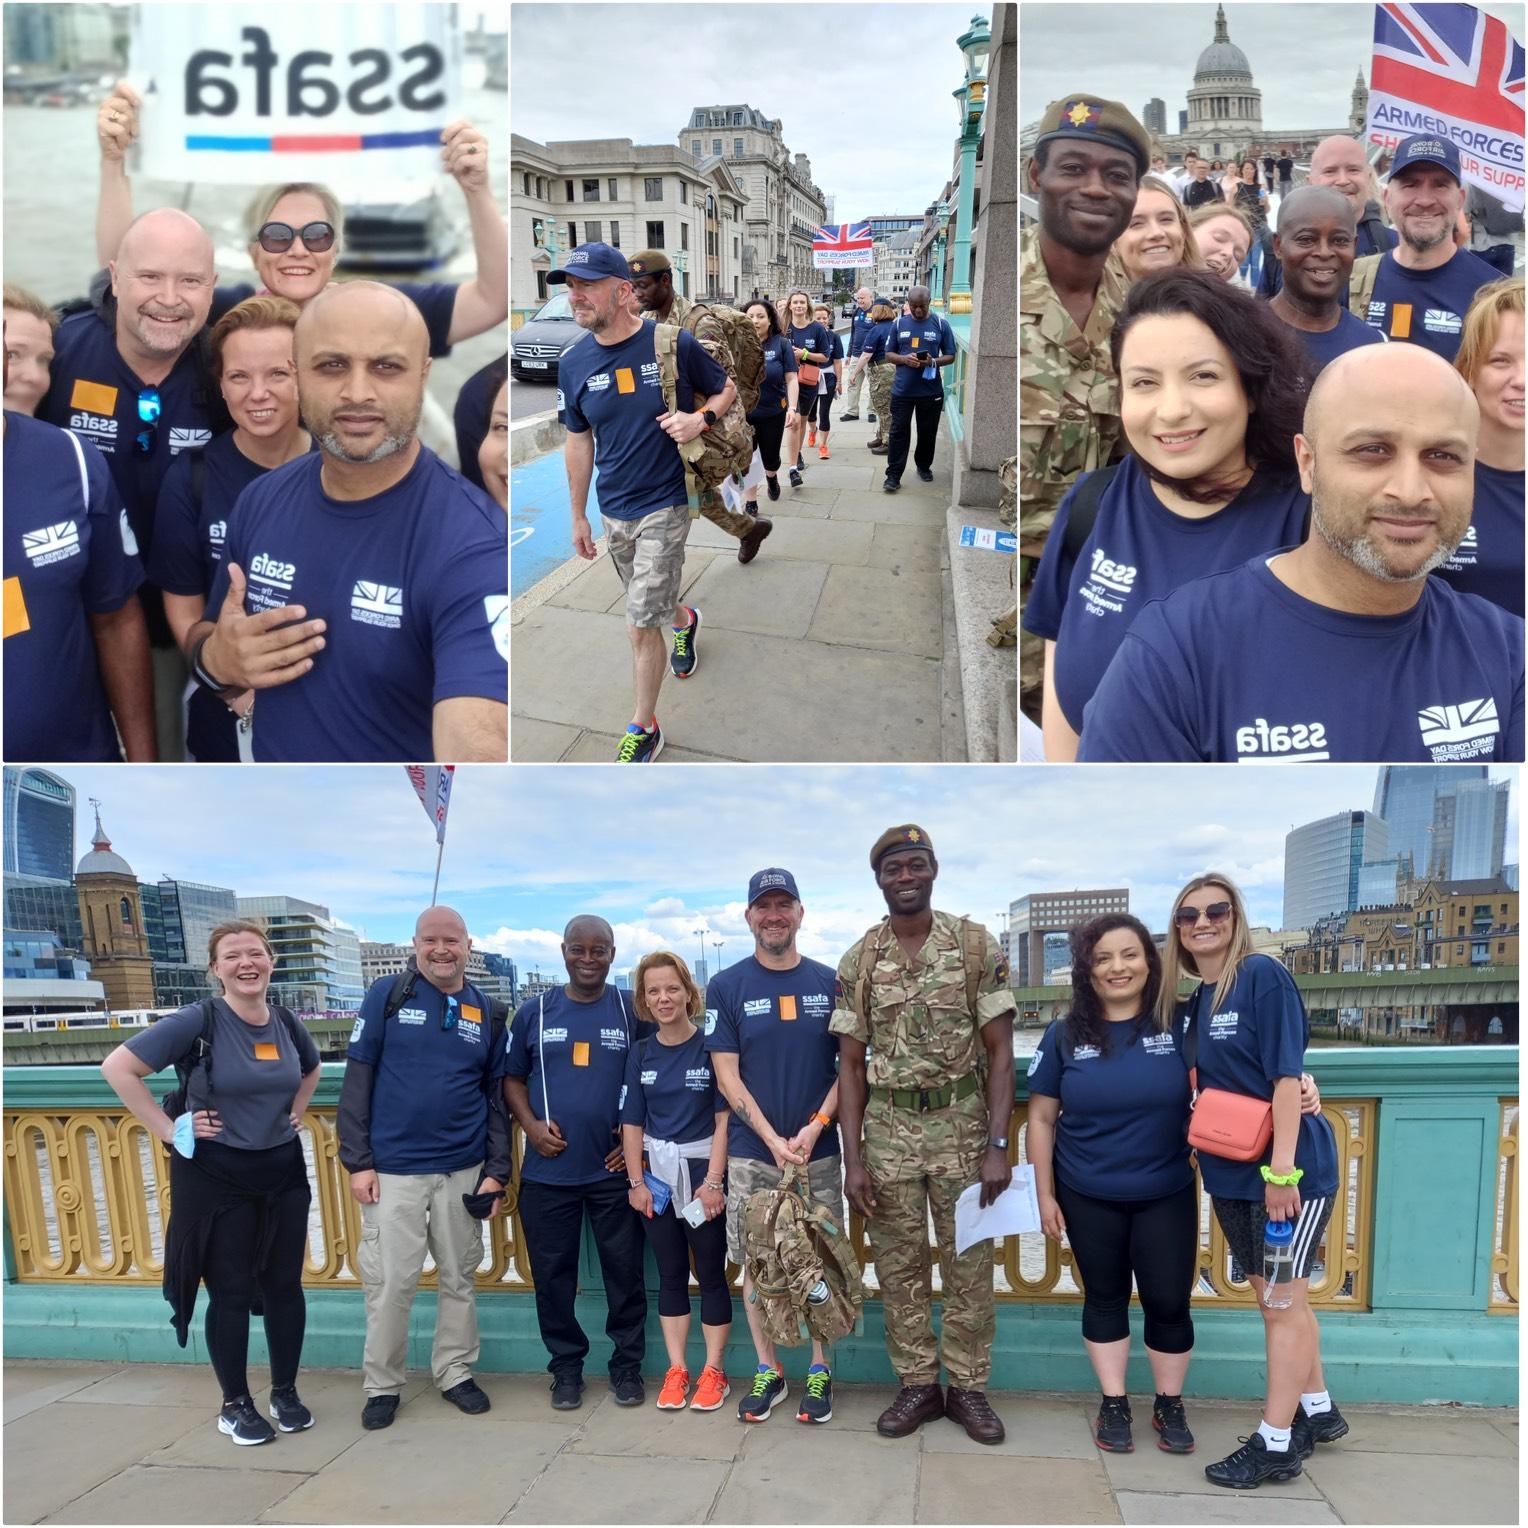 Armed Forces Day - 13 Bridges Walk